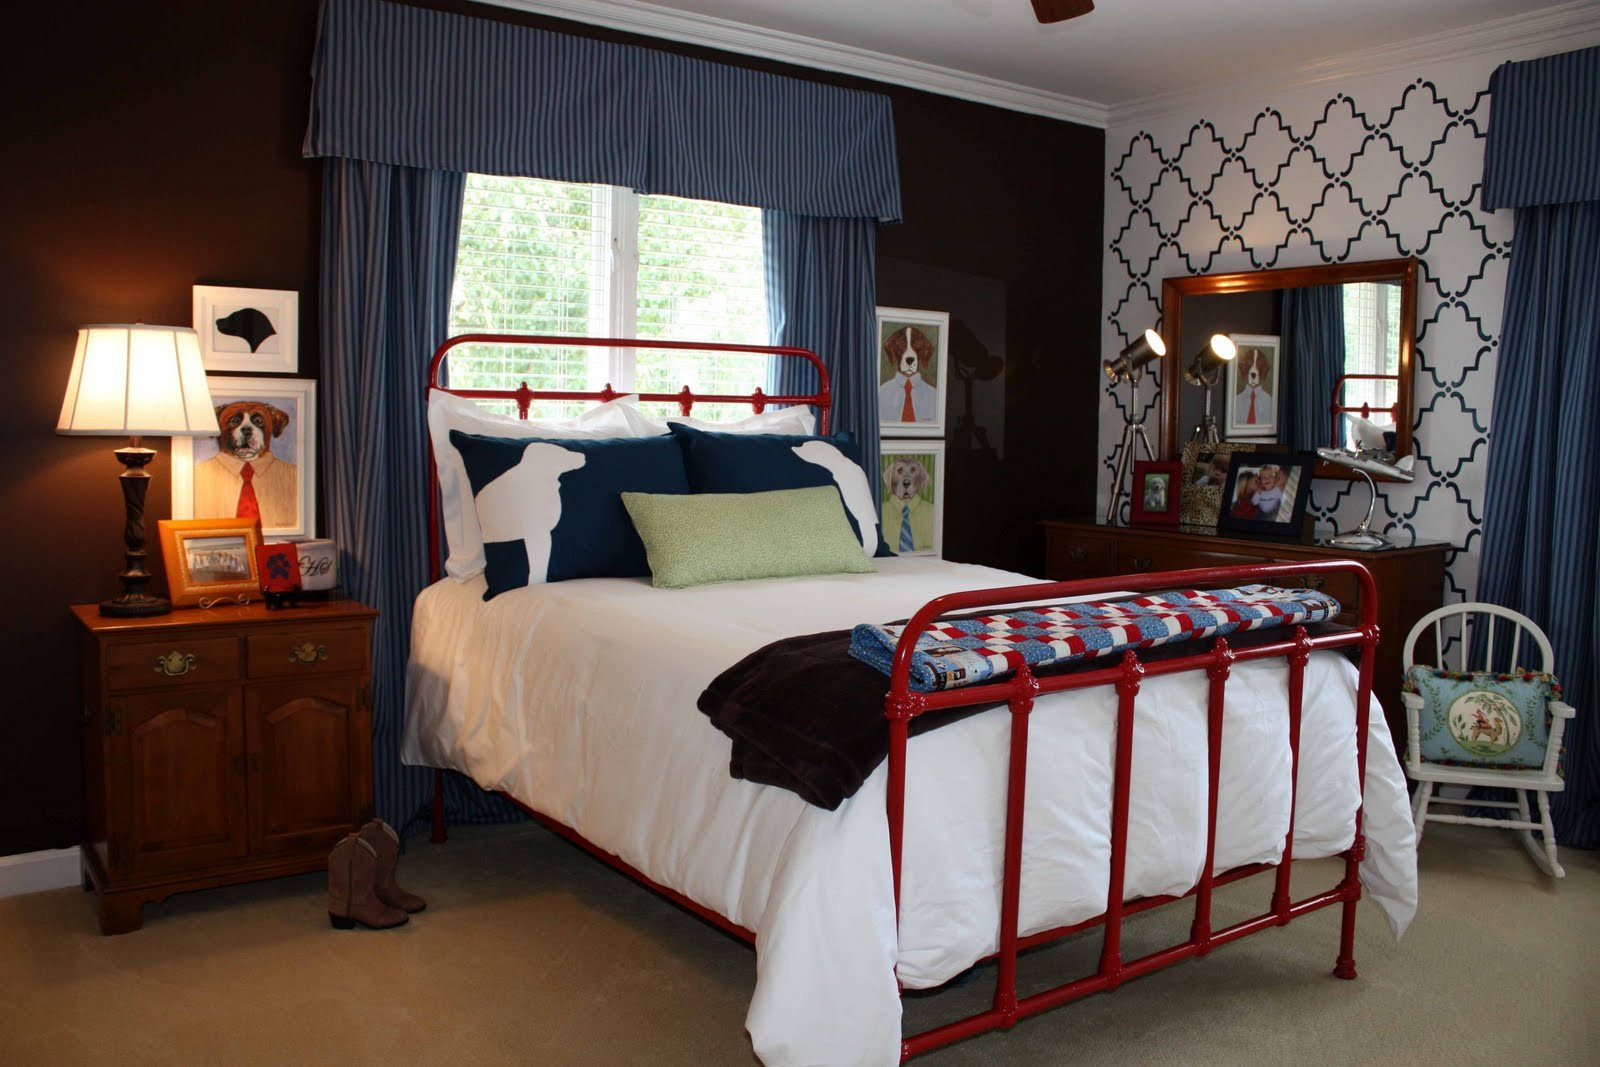 Little Boy Room Decor Ideas Lovely Dragonfly Mornings Boys Bedroom Ideas